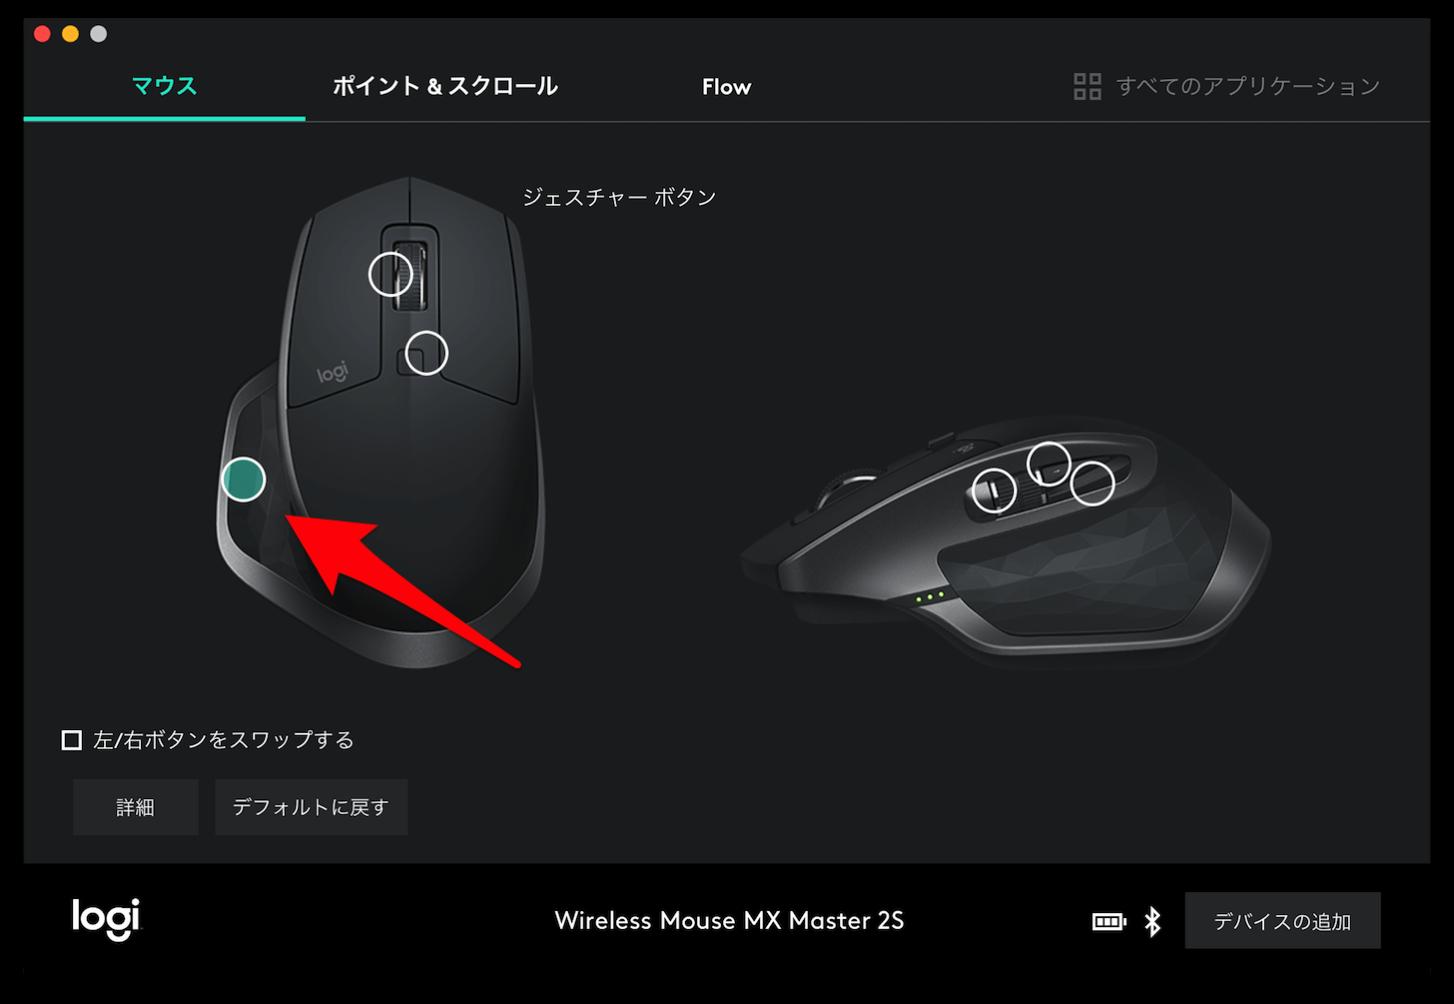 MX Master 2S setting 12